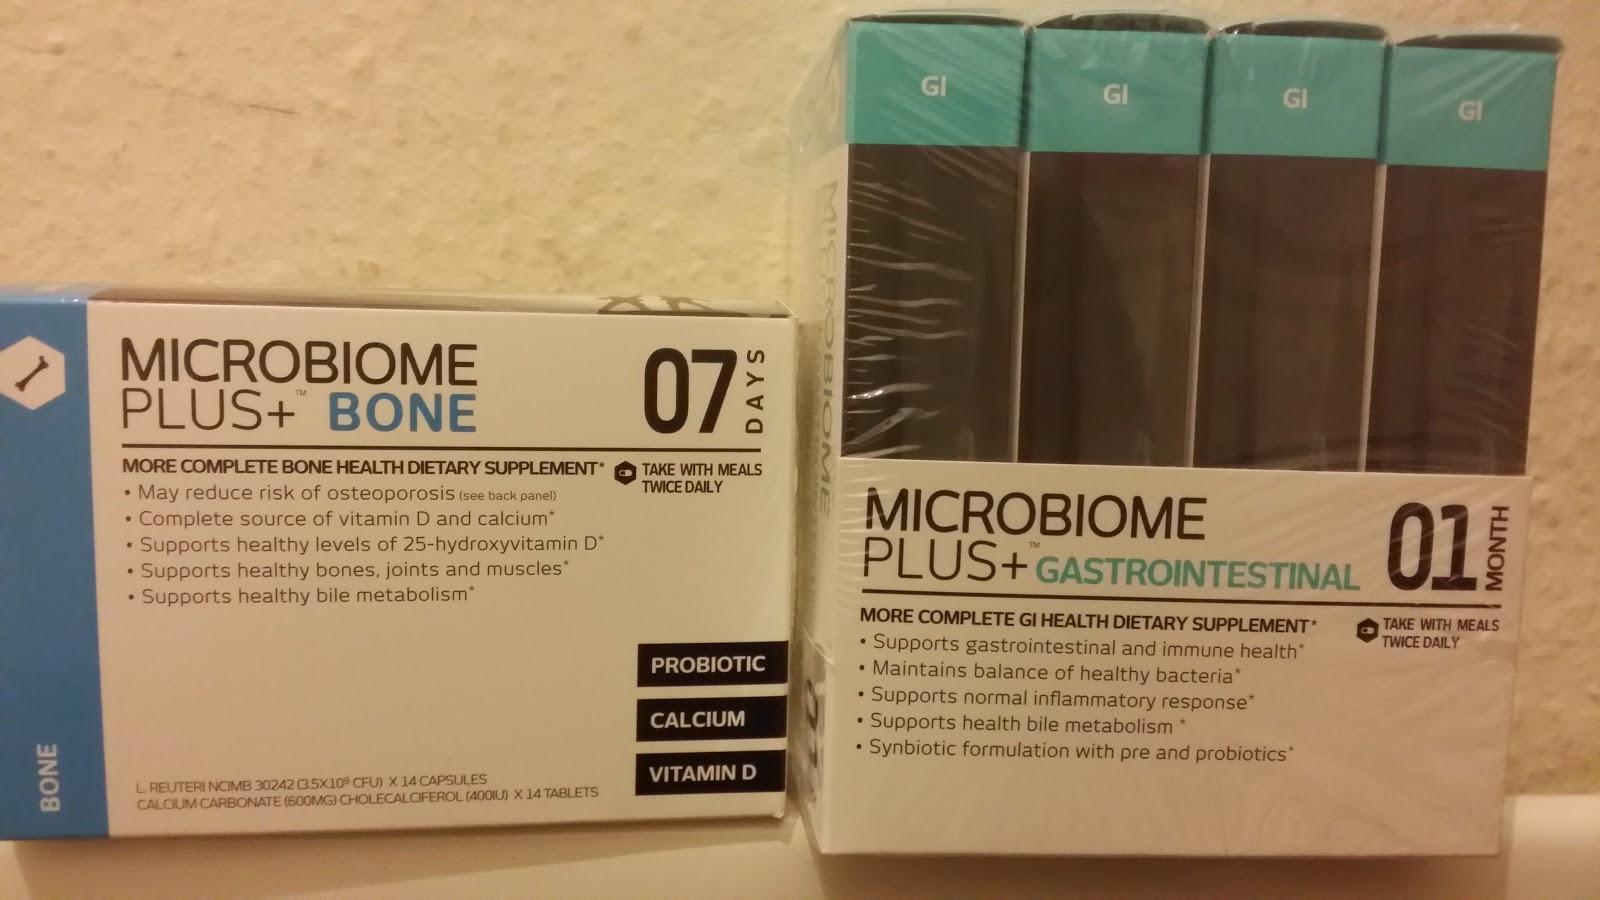 Microbiome Proboitics supplement